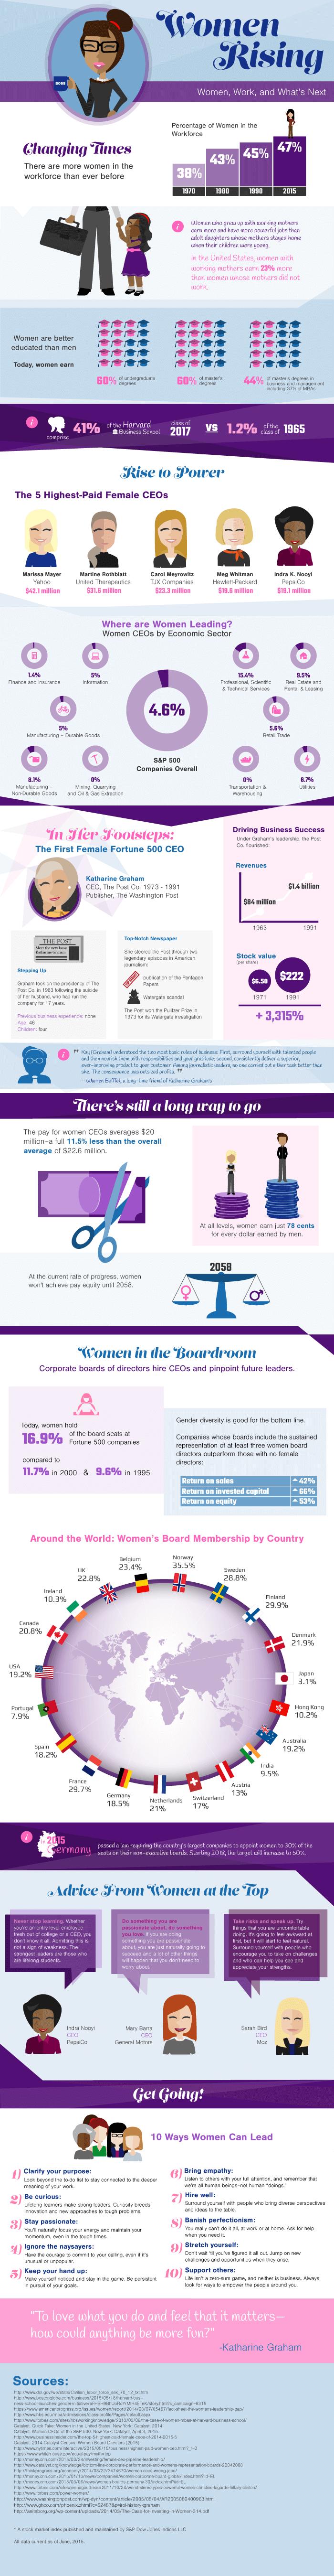 Women-Rising-Infographic